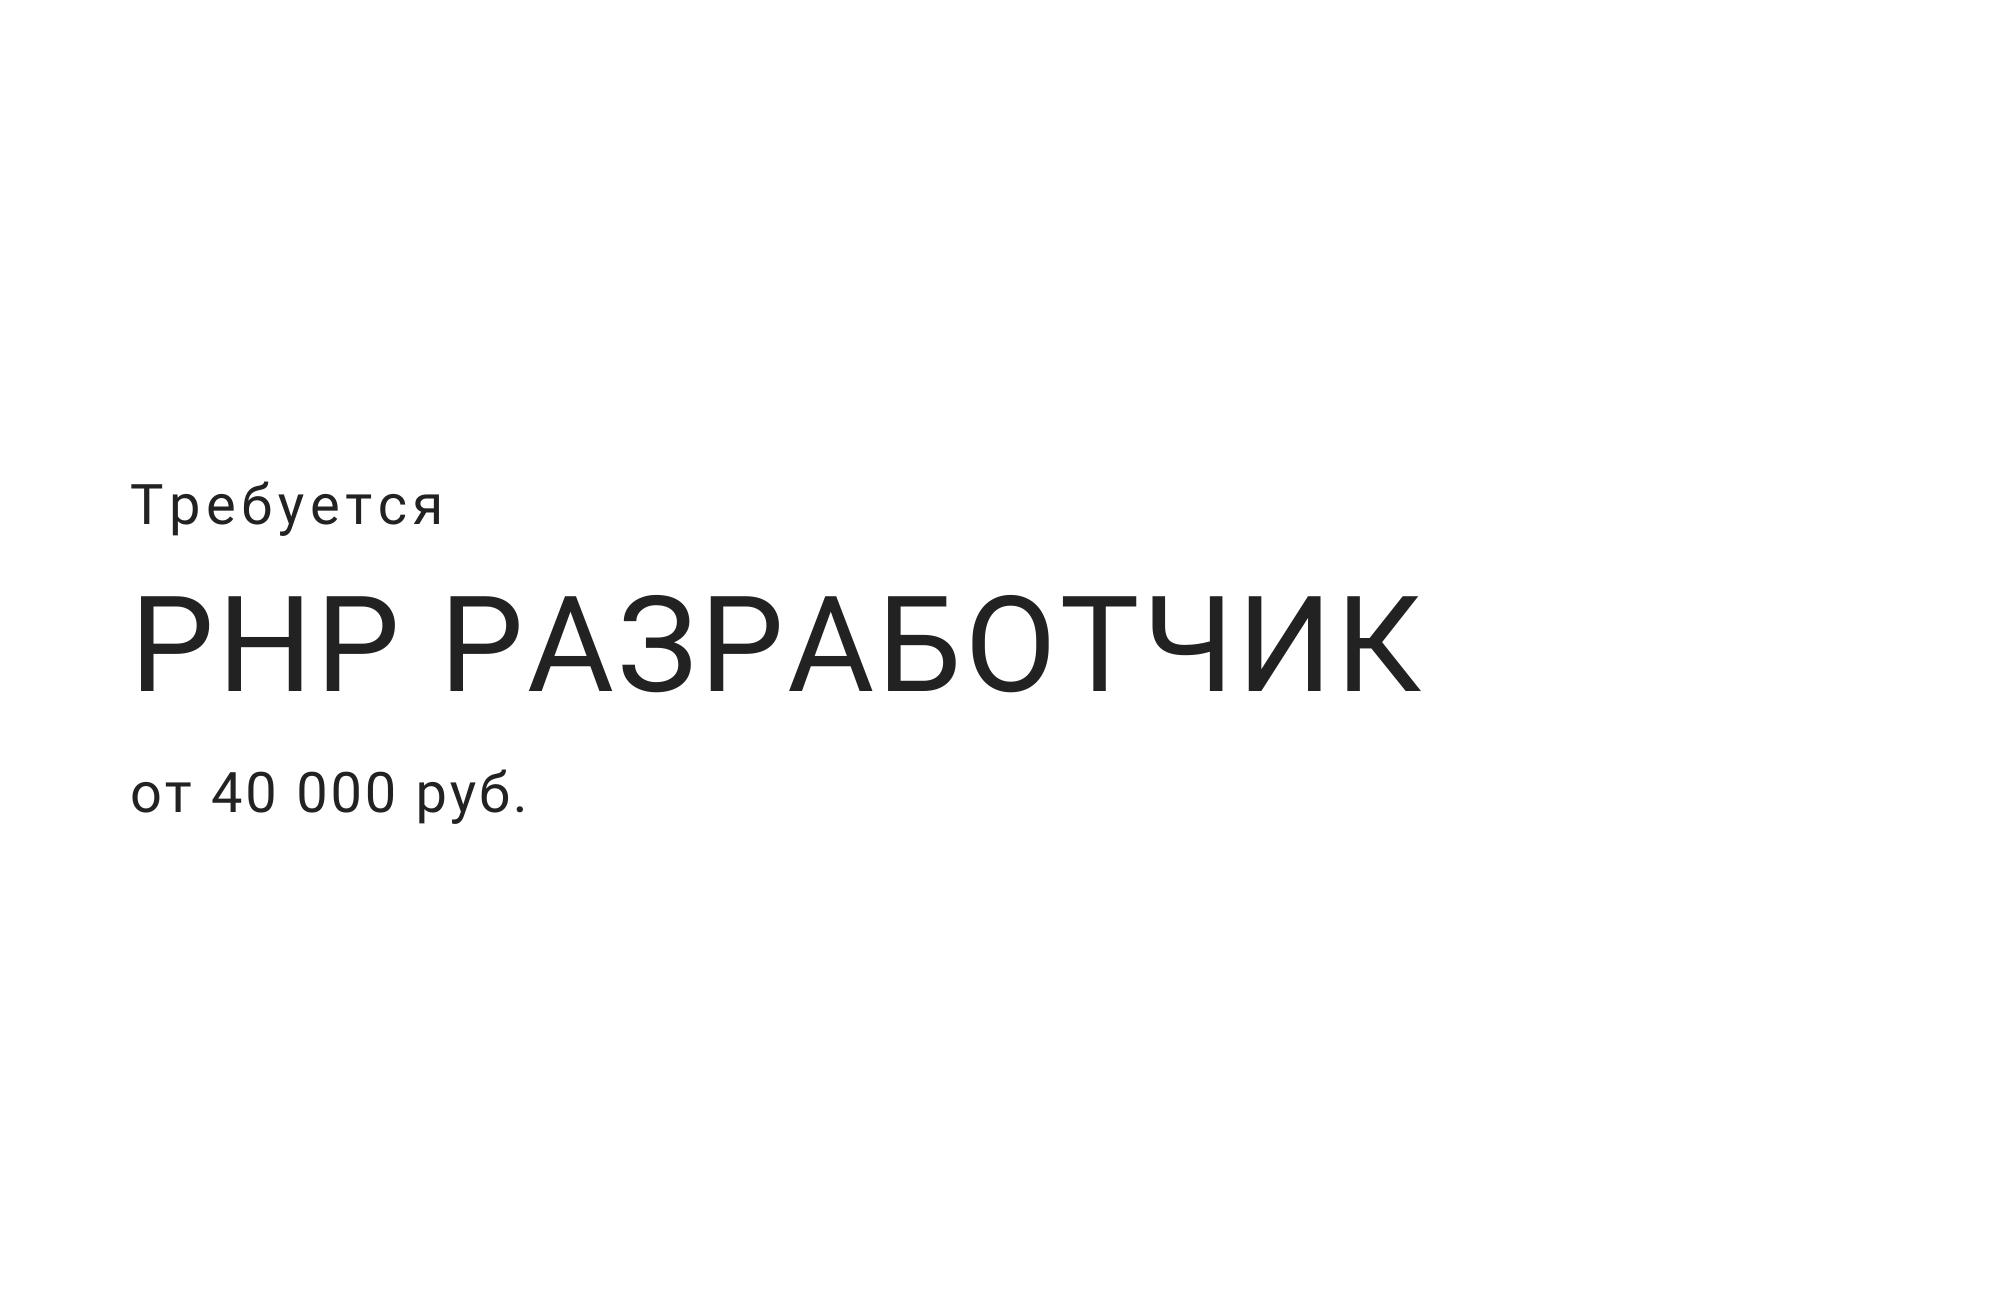 PHP разработчик